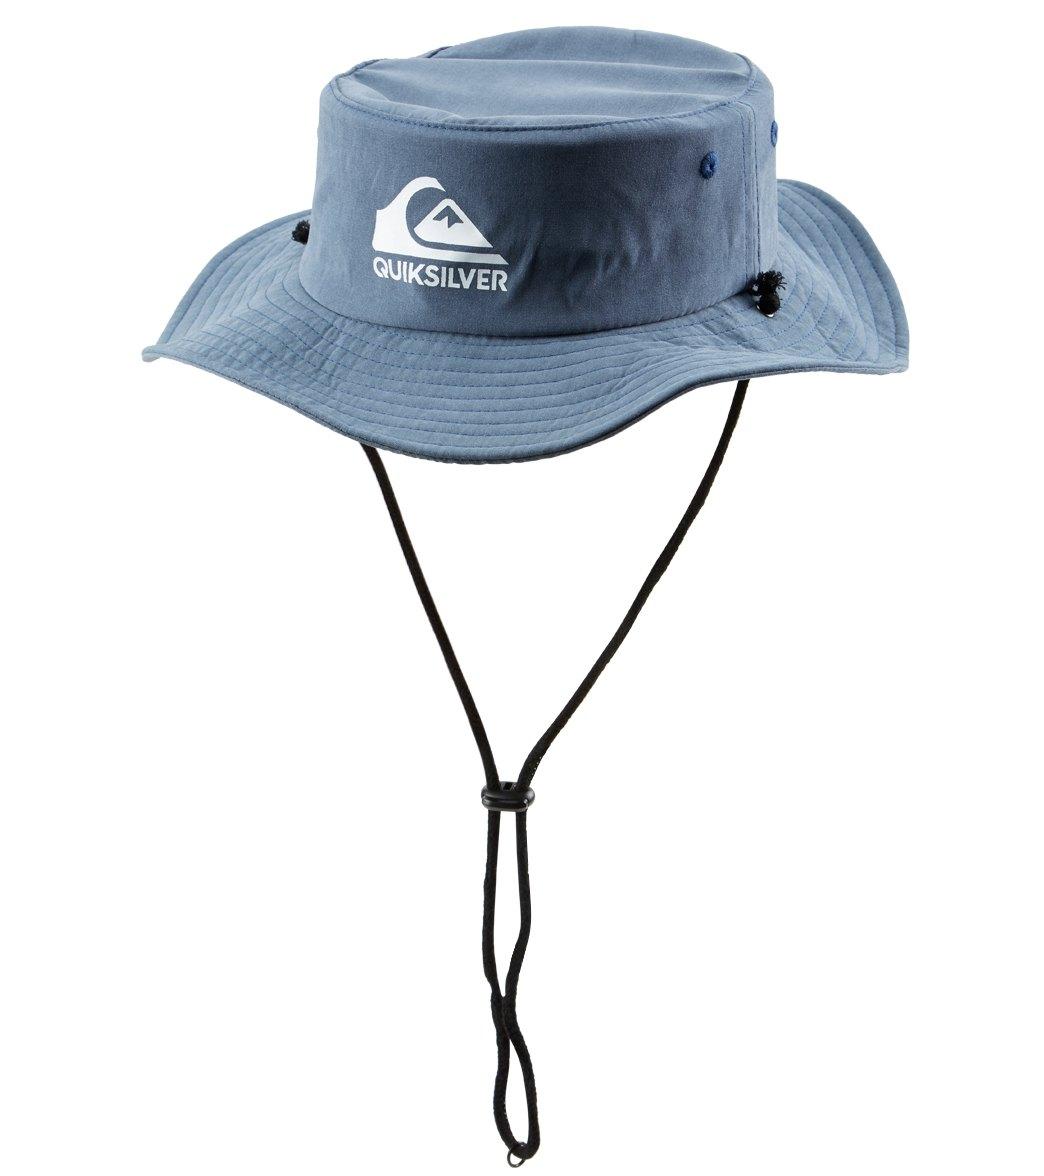 21f4e430bbab7 Quiksilver Boys  Gelly 4 Microfiber bucket Cap (Little Kid) at ...